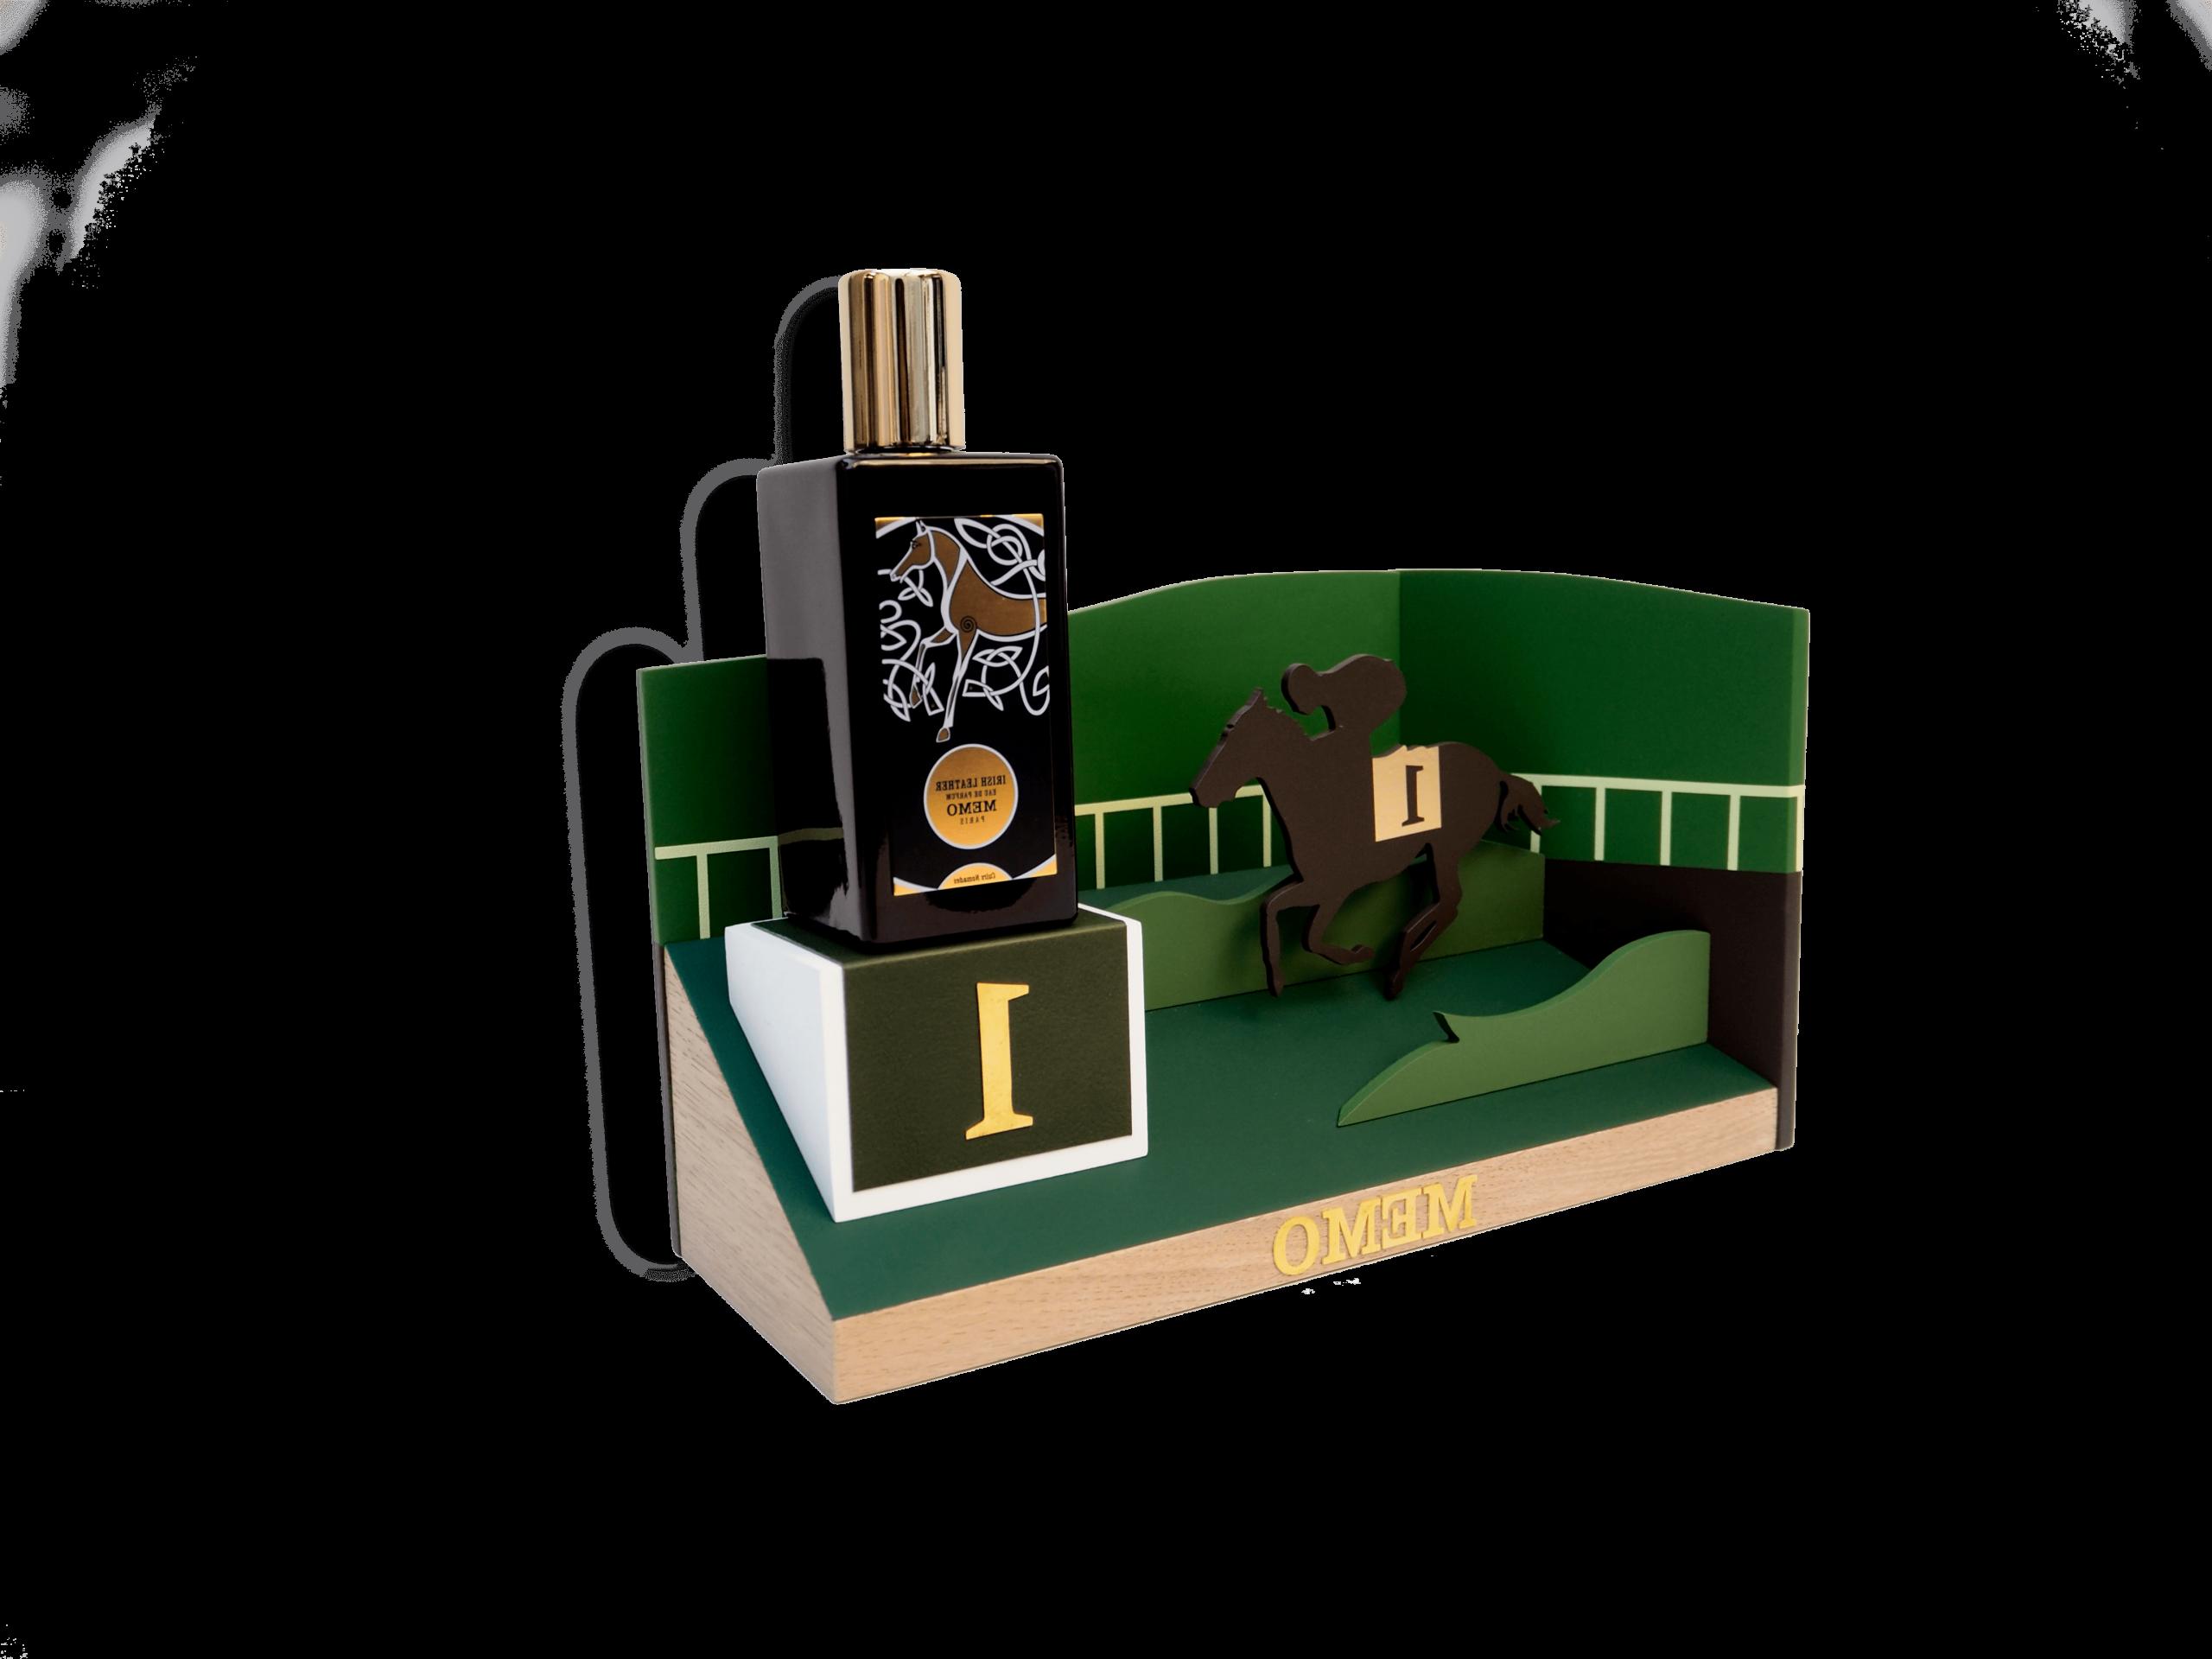 IrishLeather-MEMO-perfume-parfum-cambon-presentoir-mersh-vitrine-window-boutique-OKTO-_03-min